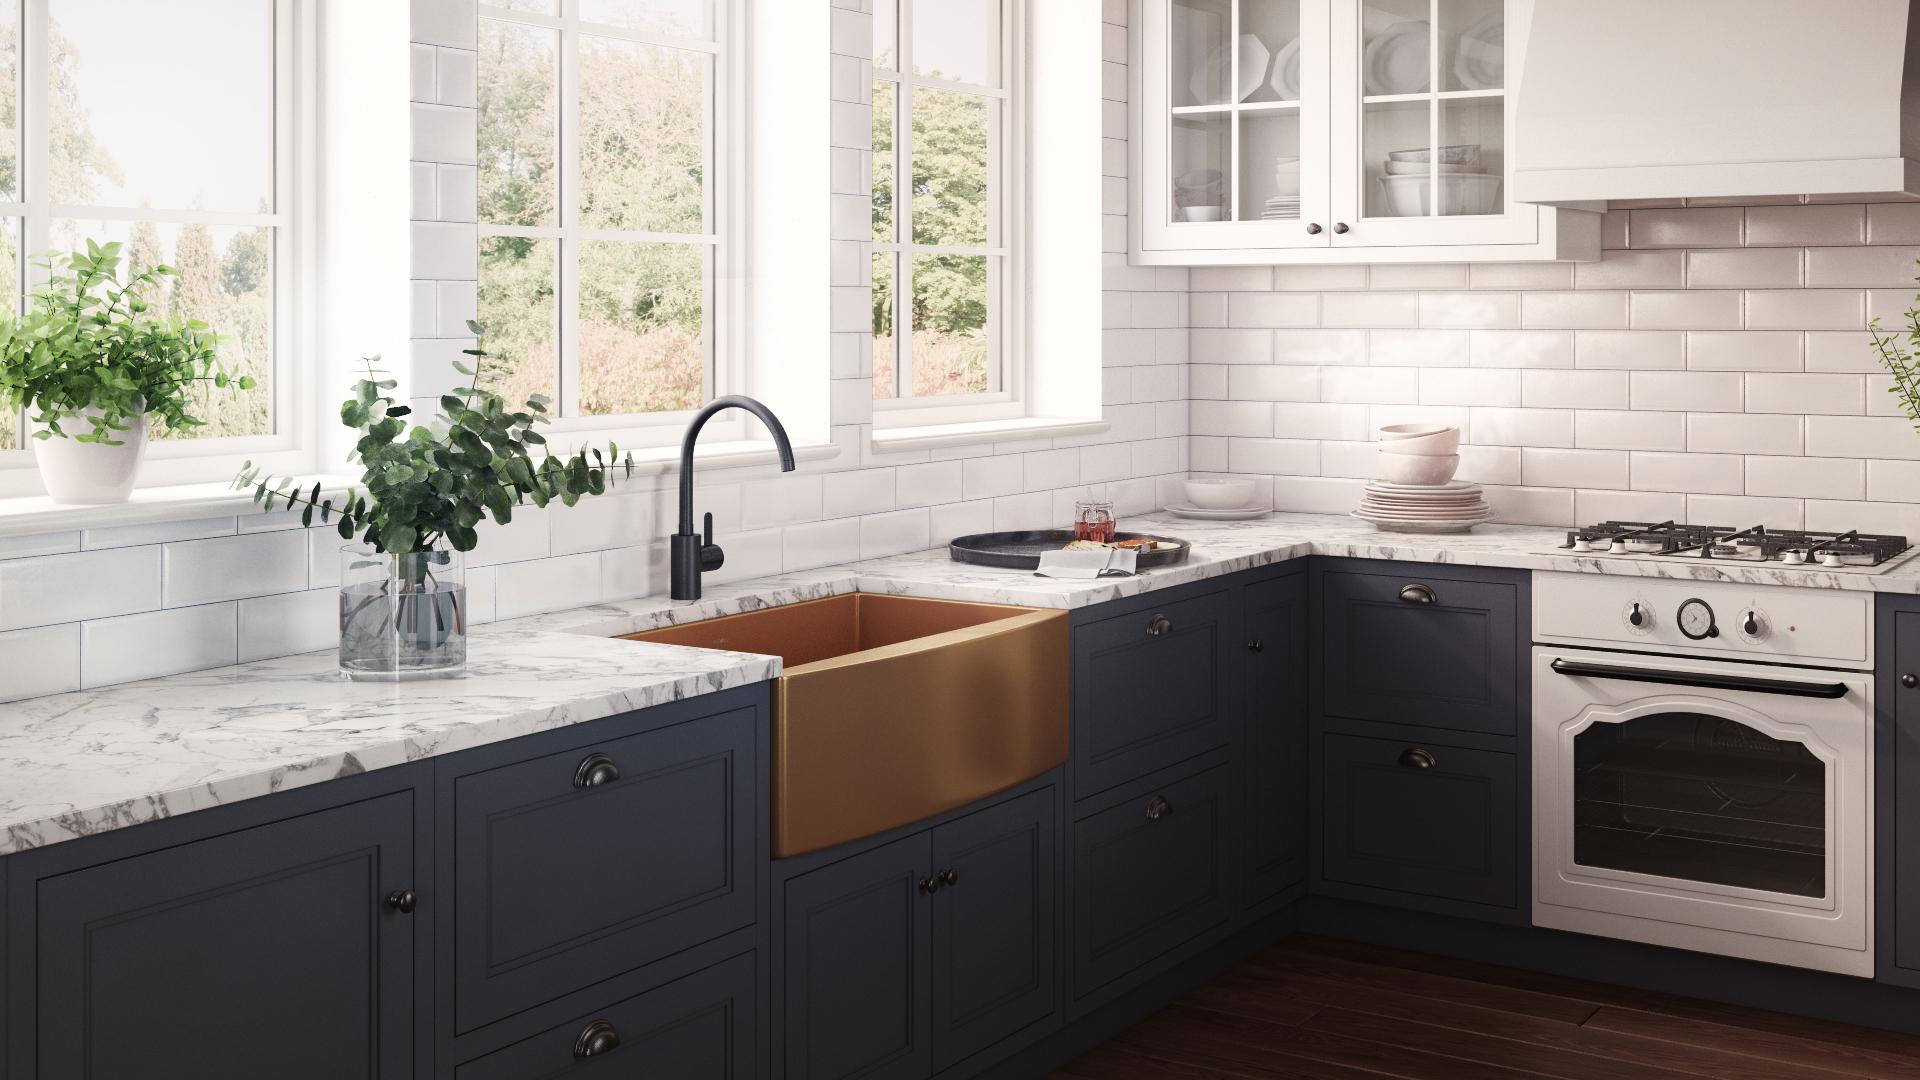 36-inch Apron-Front Farmhouse Kitchen Sink - Copper Tone Matte Bronze  Stainless Steel Single Bowl